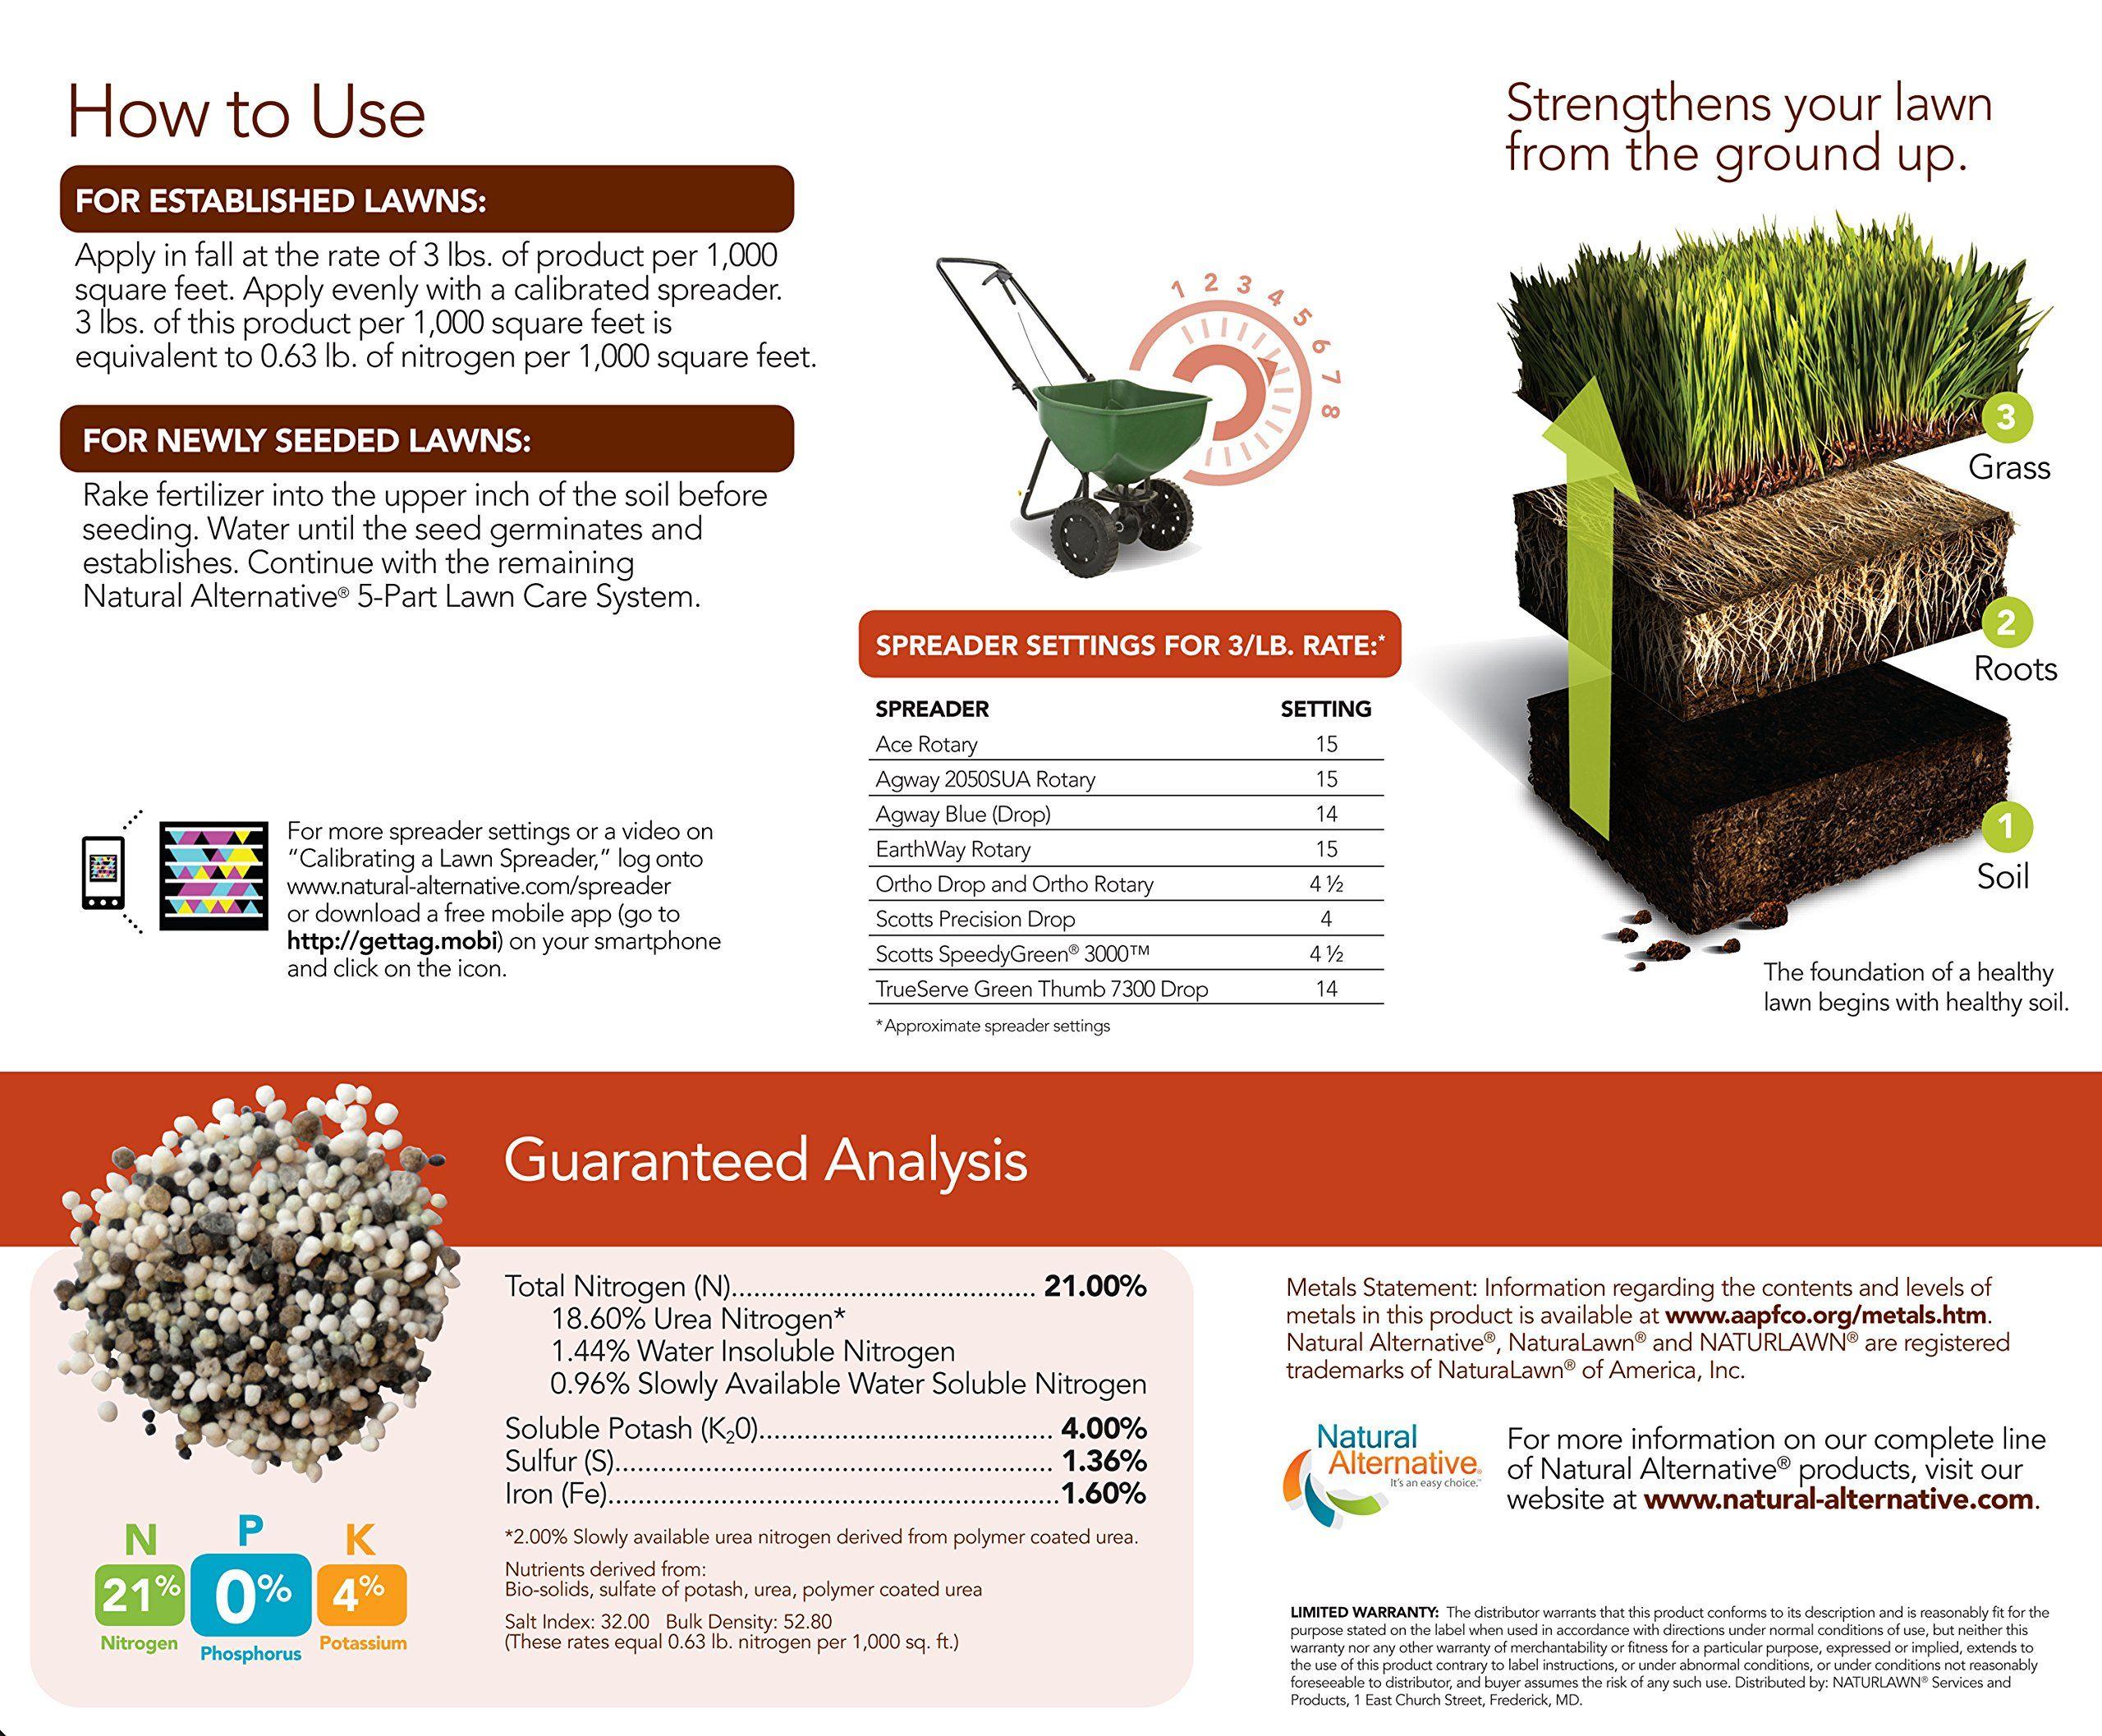 Natural Alternative Fall Lawn Fertilizer 2104 Enriched